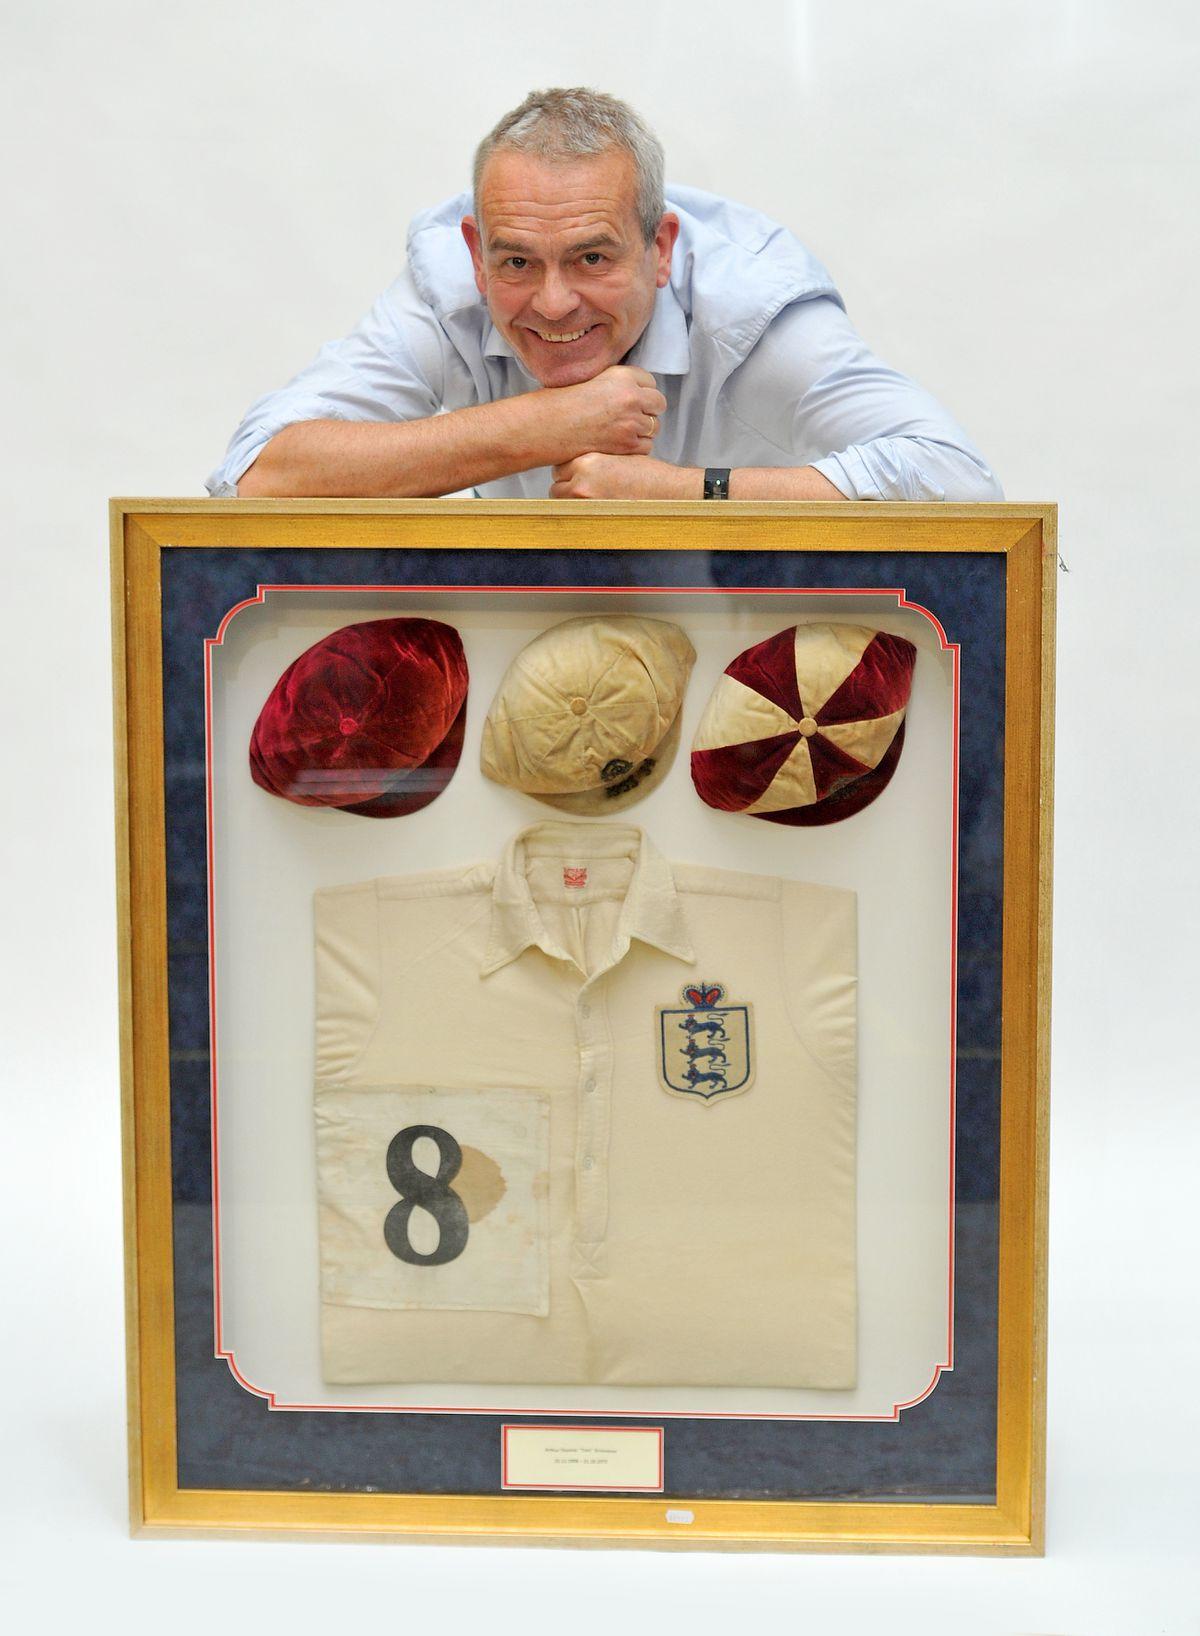 Nick Davies with Tom's shirt and caps